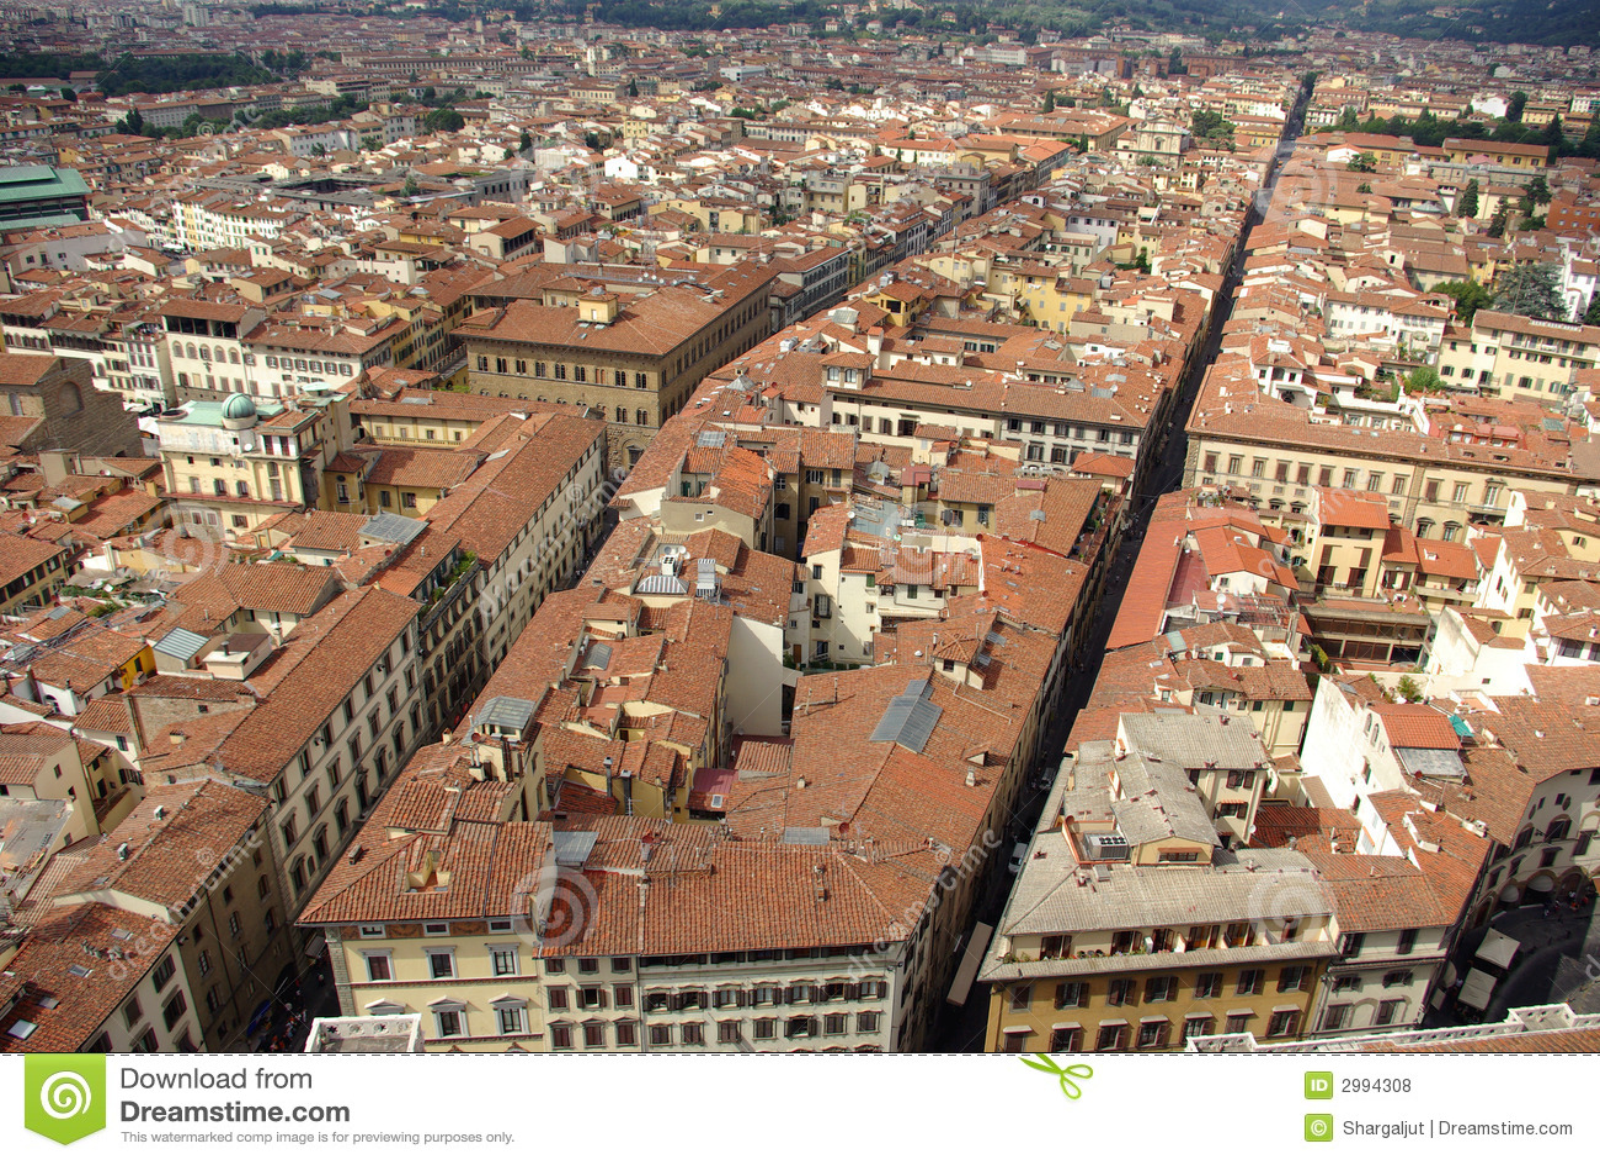 Florence italy tuscany